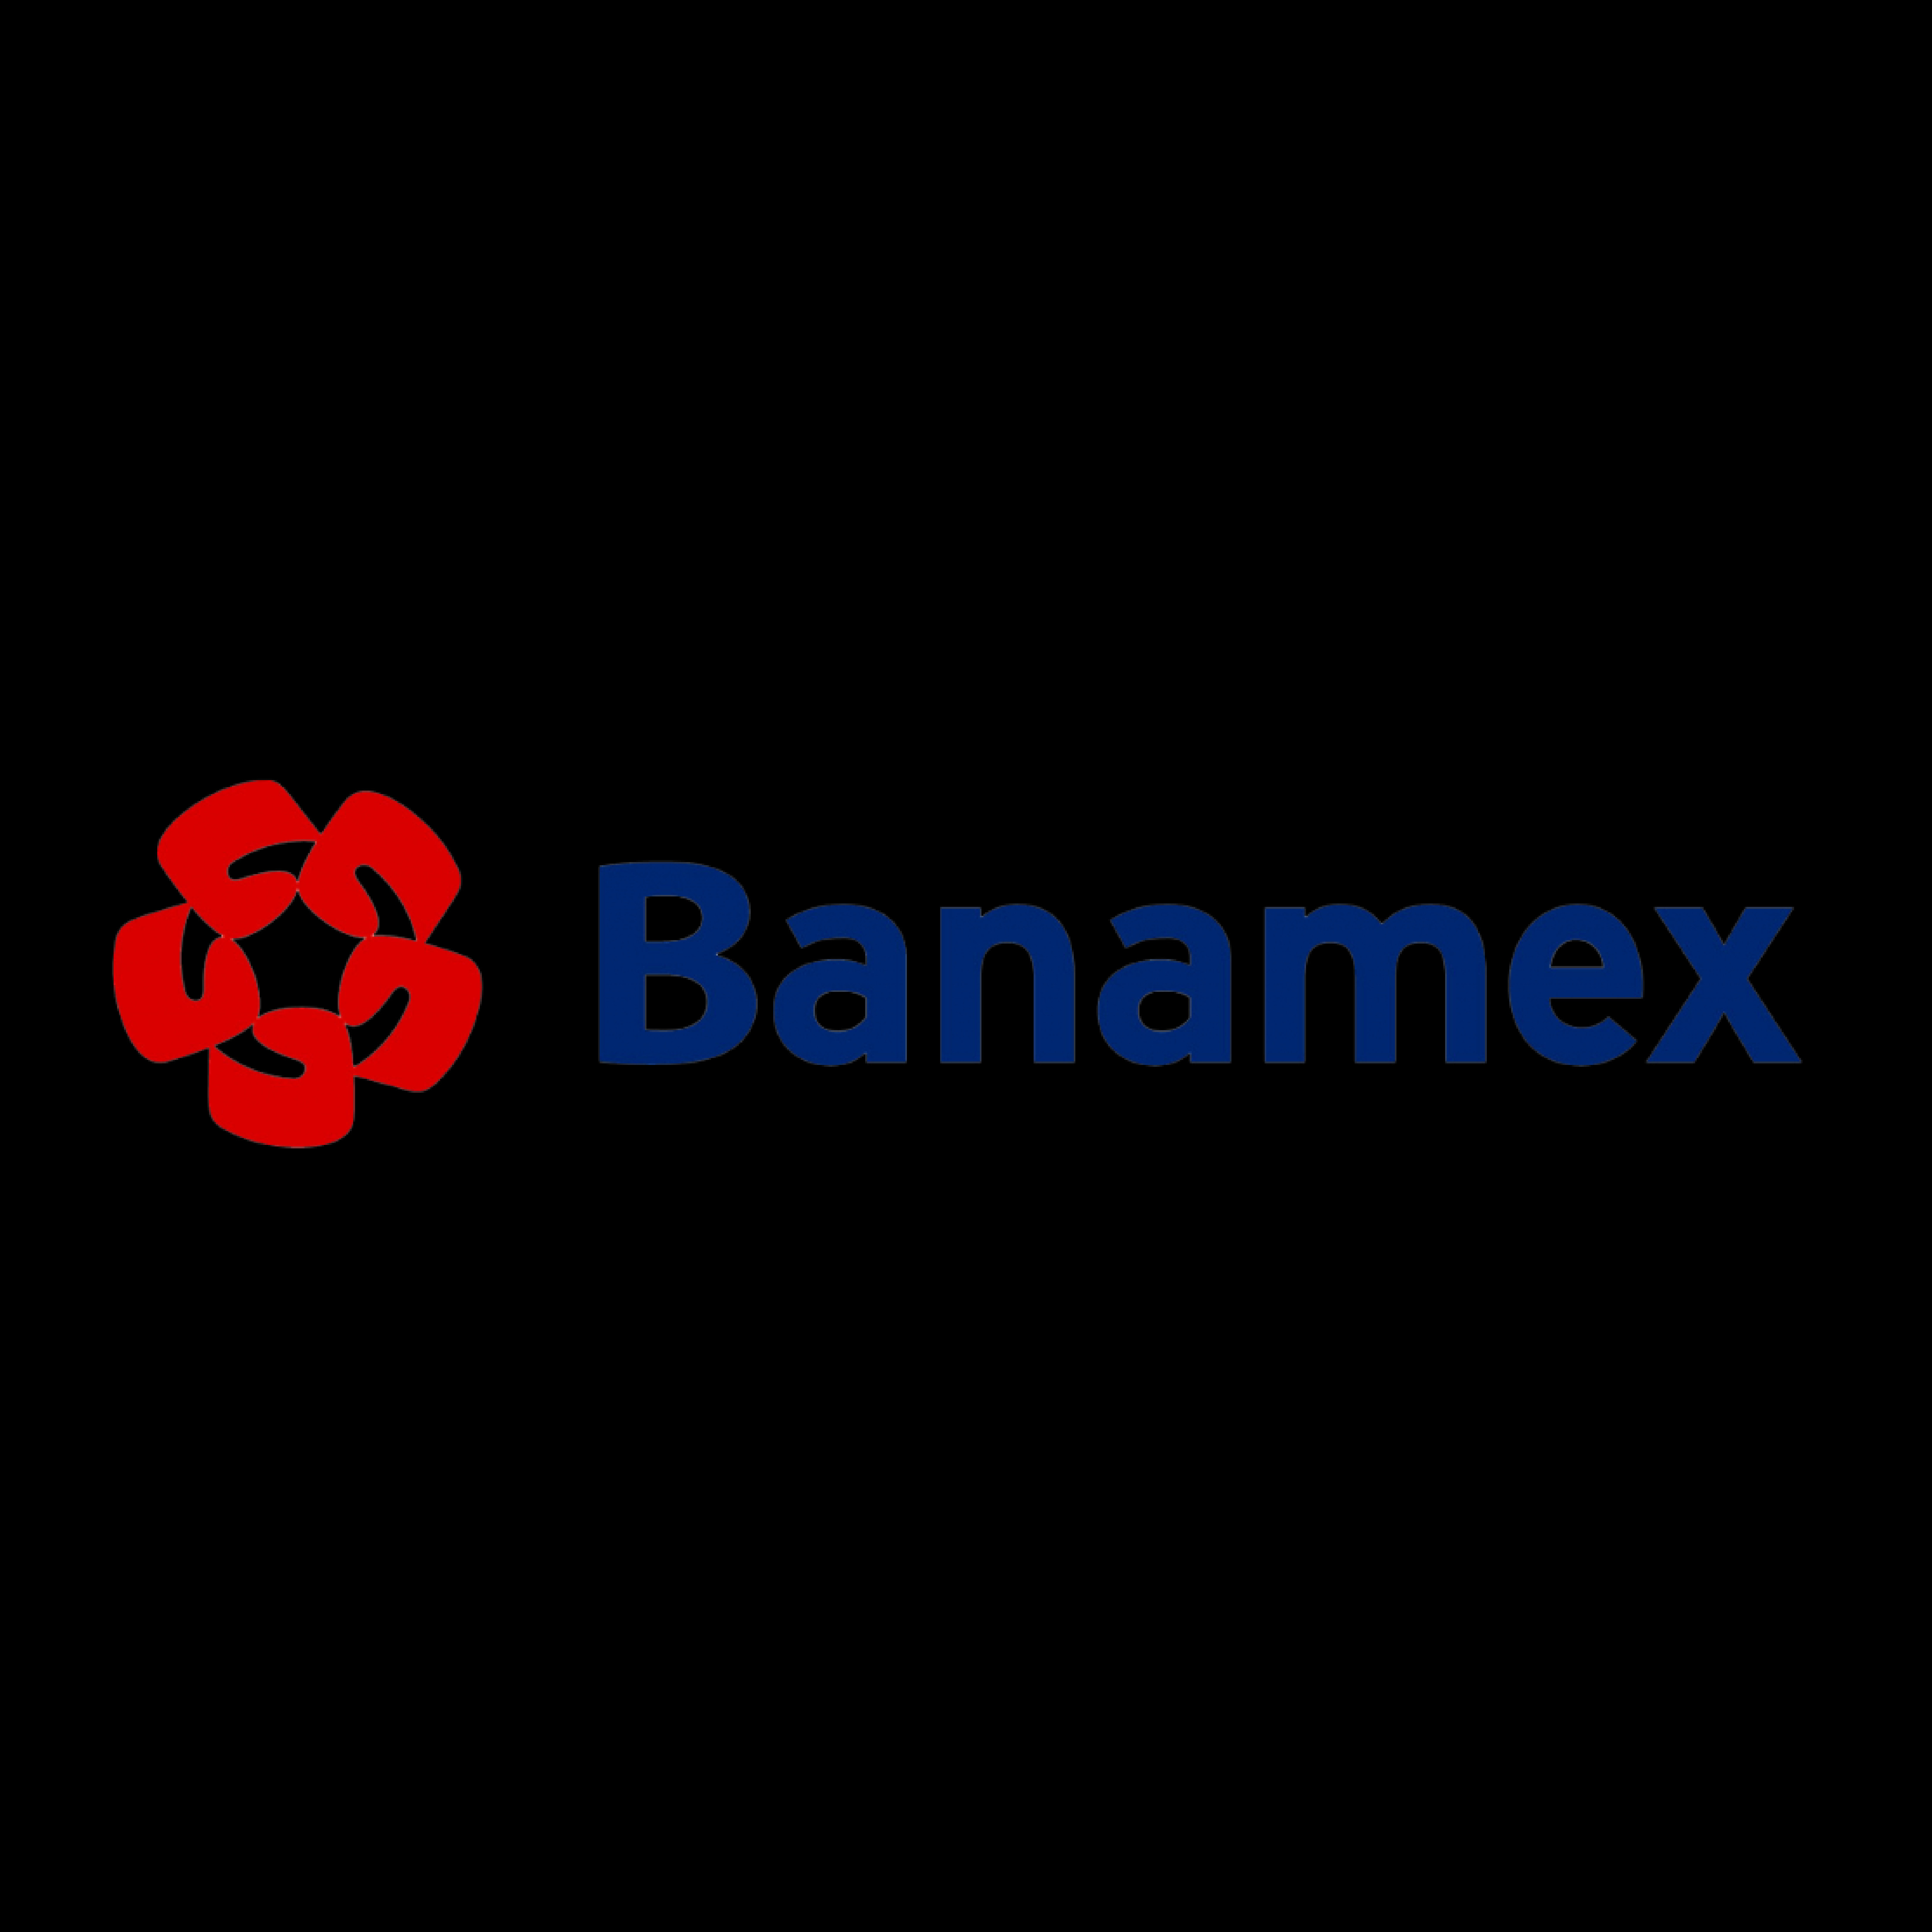 Banamex.png.